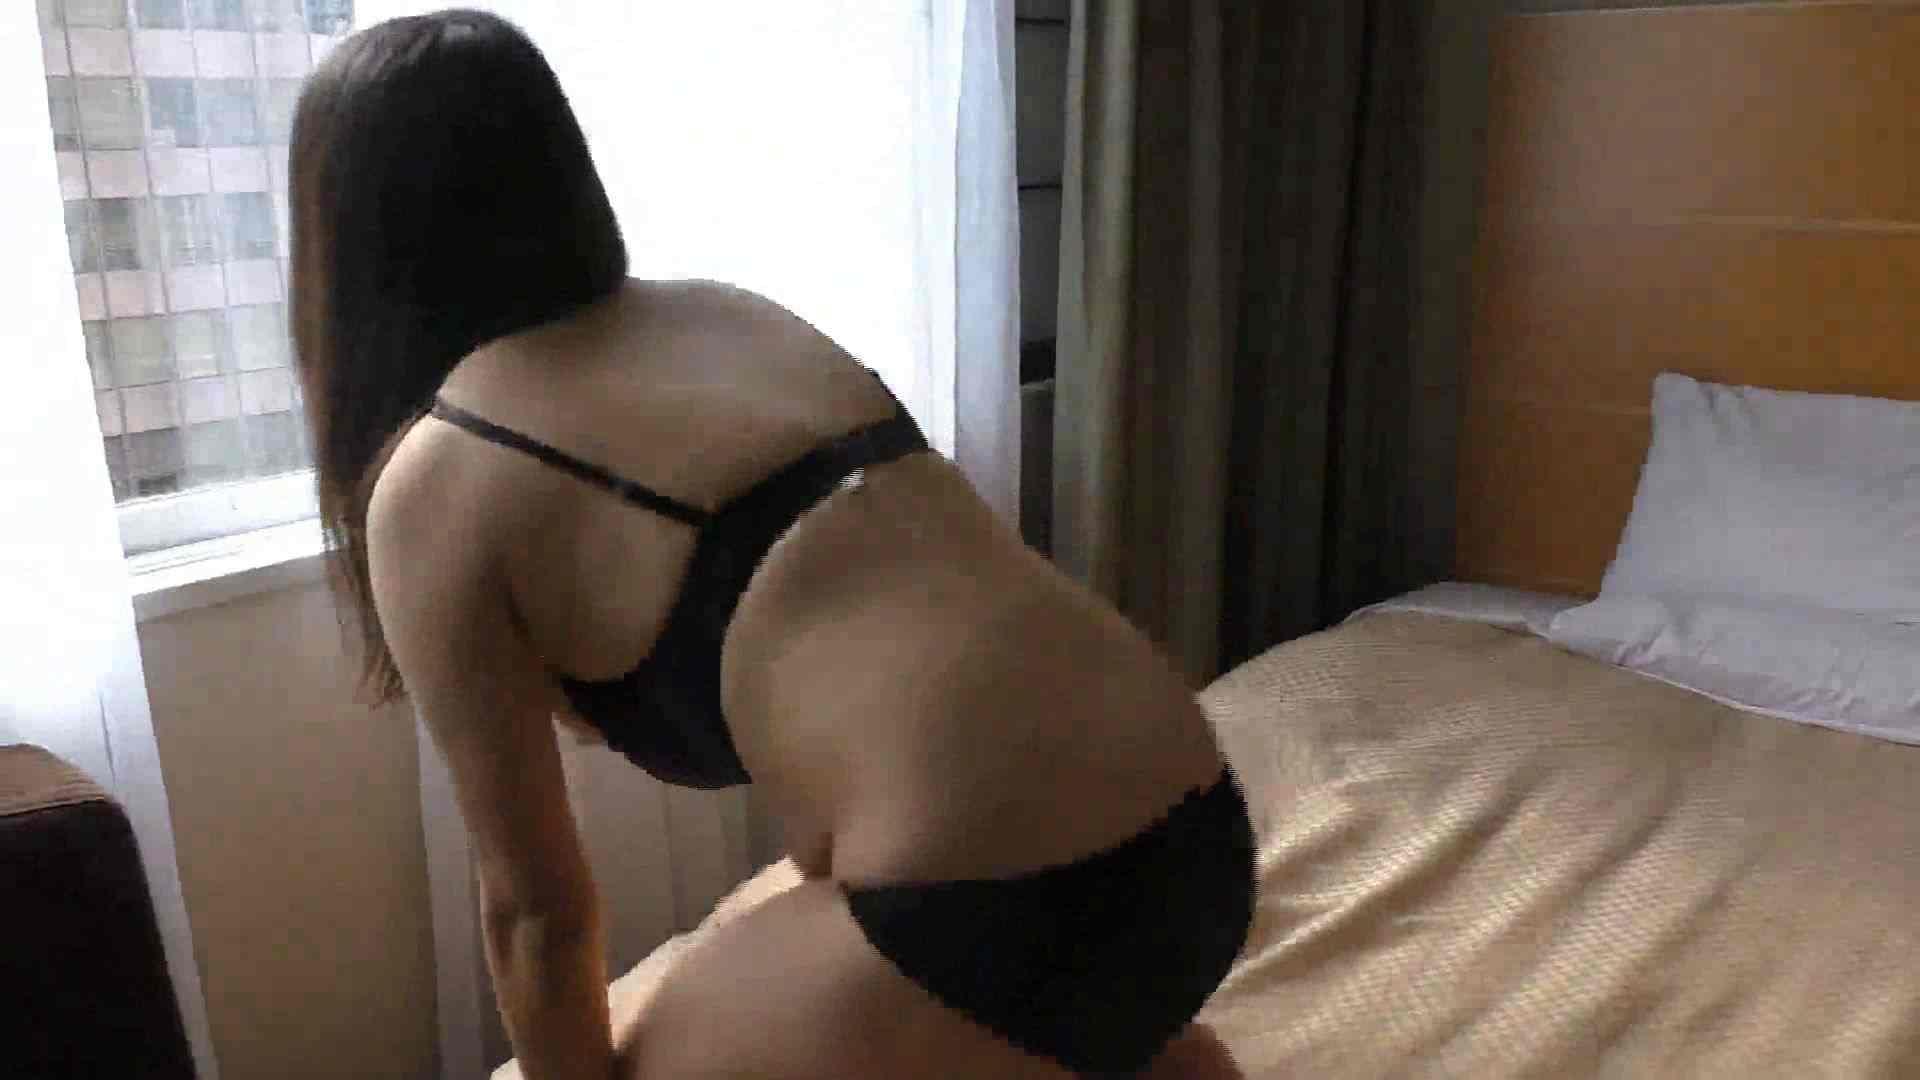 S級厳選美女ビッチガールVol.22 モデルのエッチ | OLヌード天国  60PIX 19